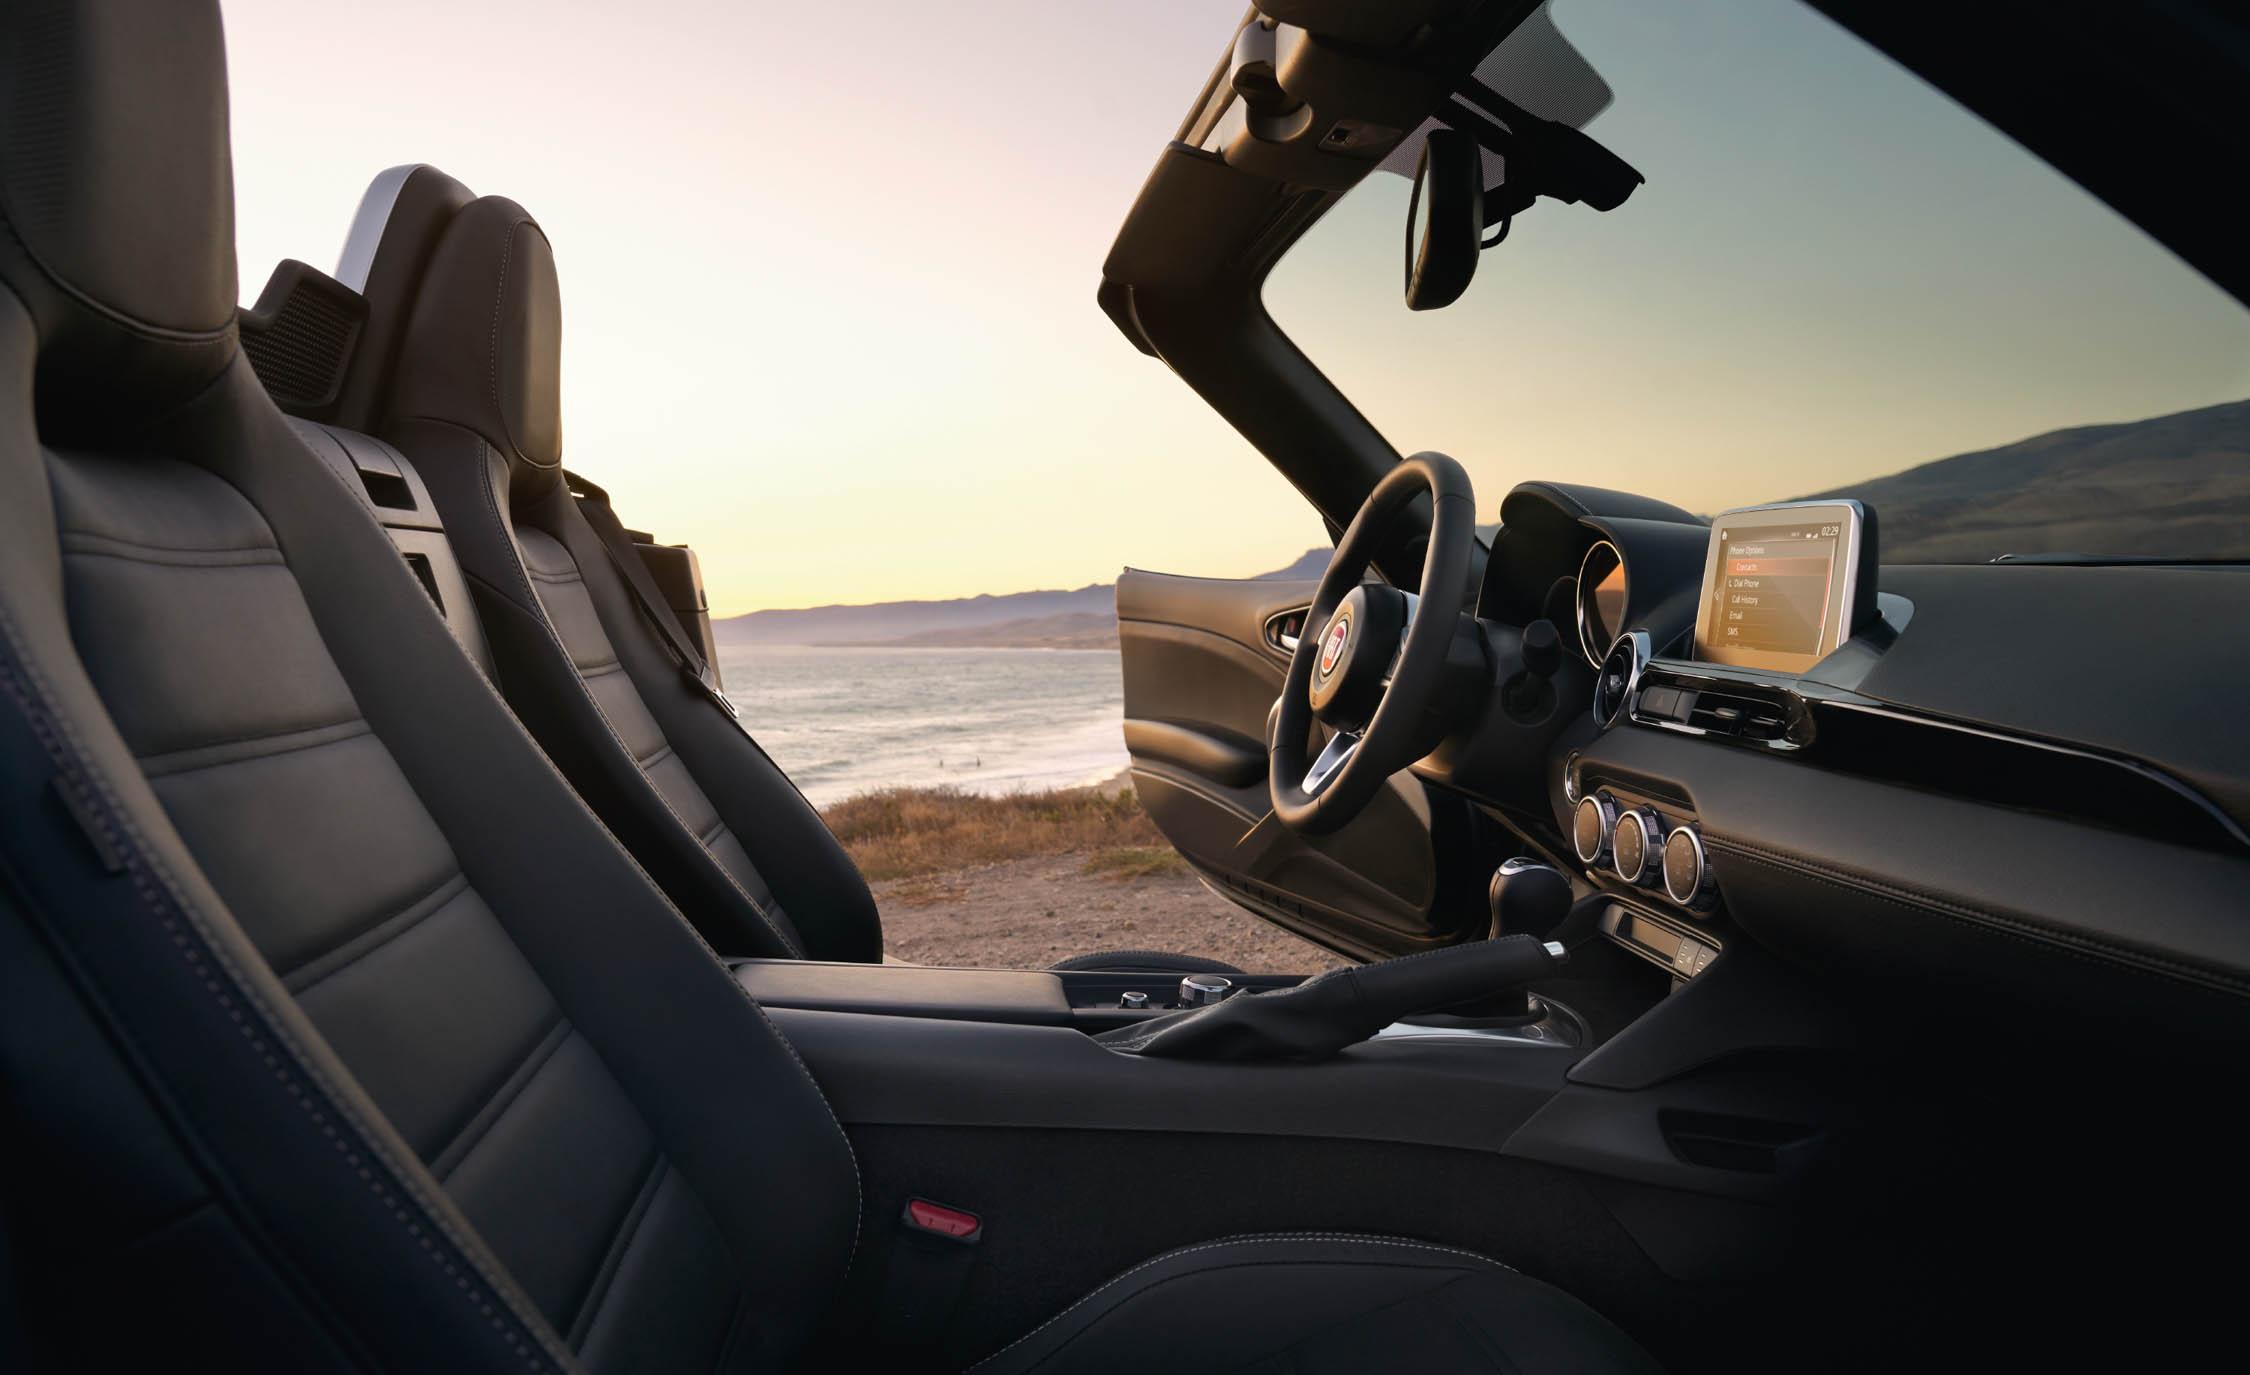 2017 Fiat 124 Spider Interior Seats (Photo 17 of 23)